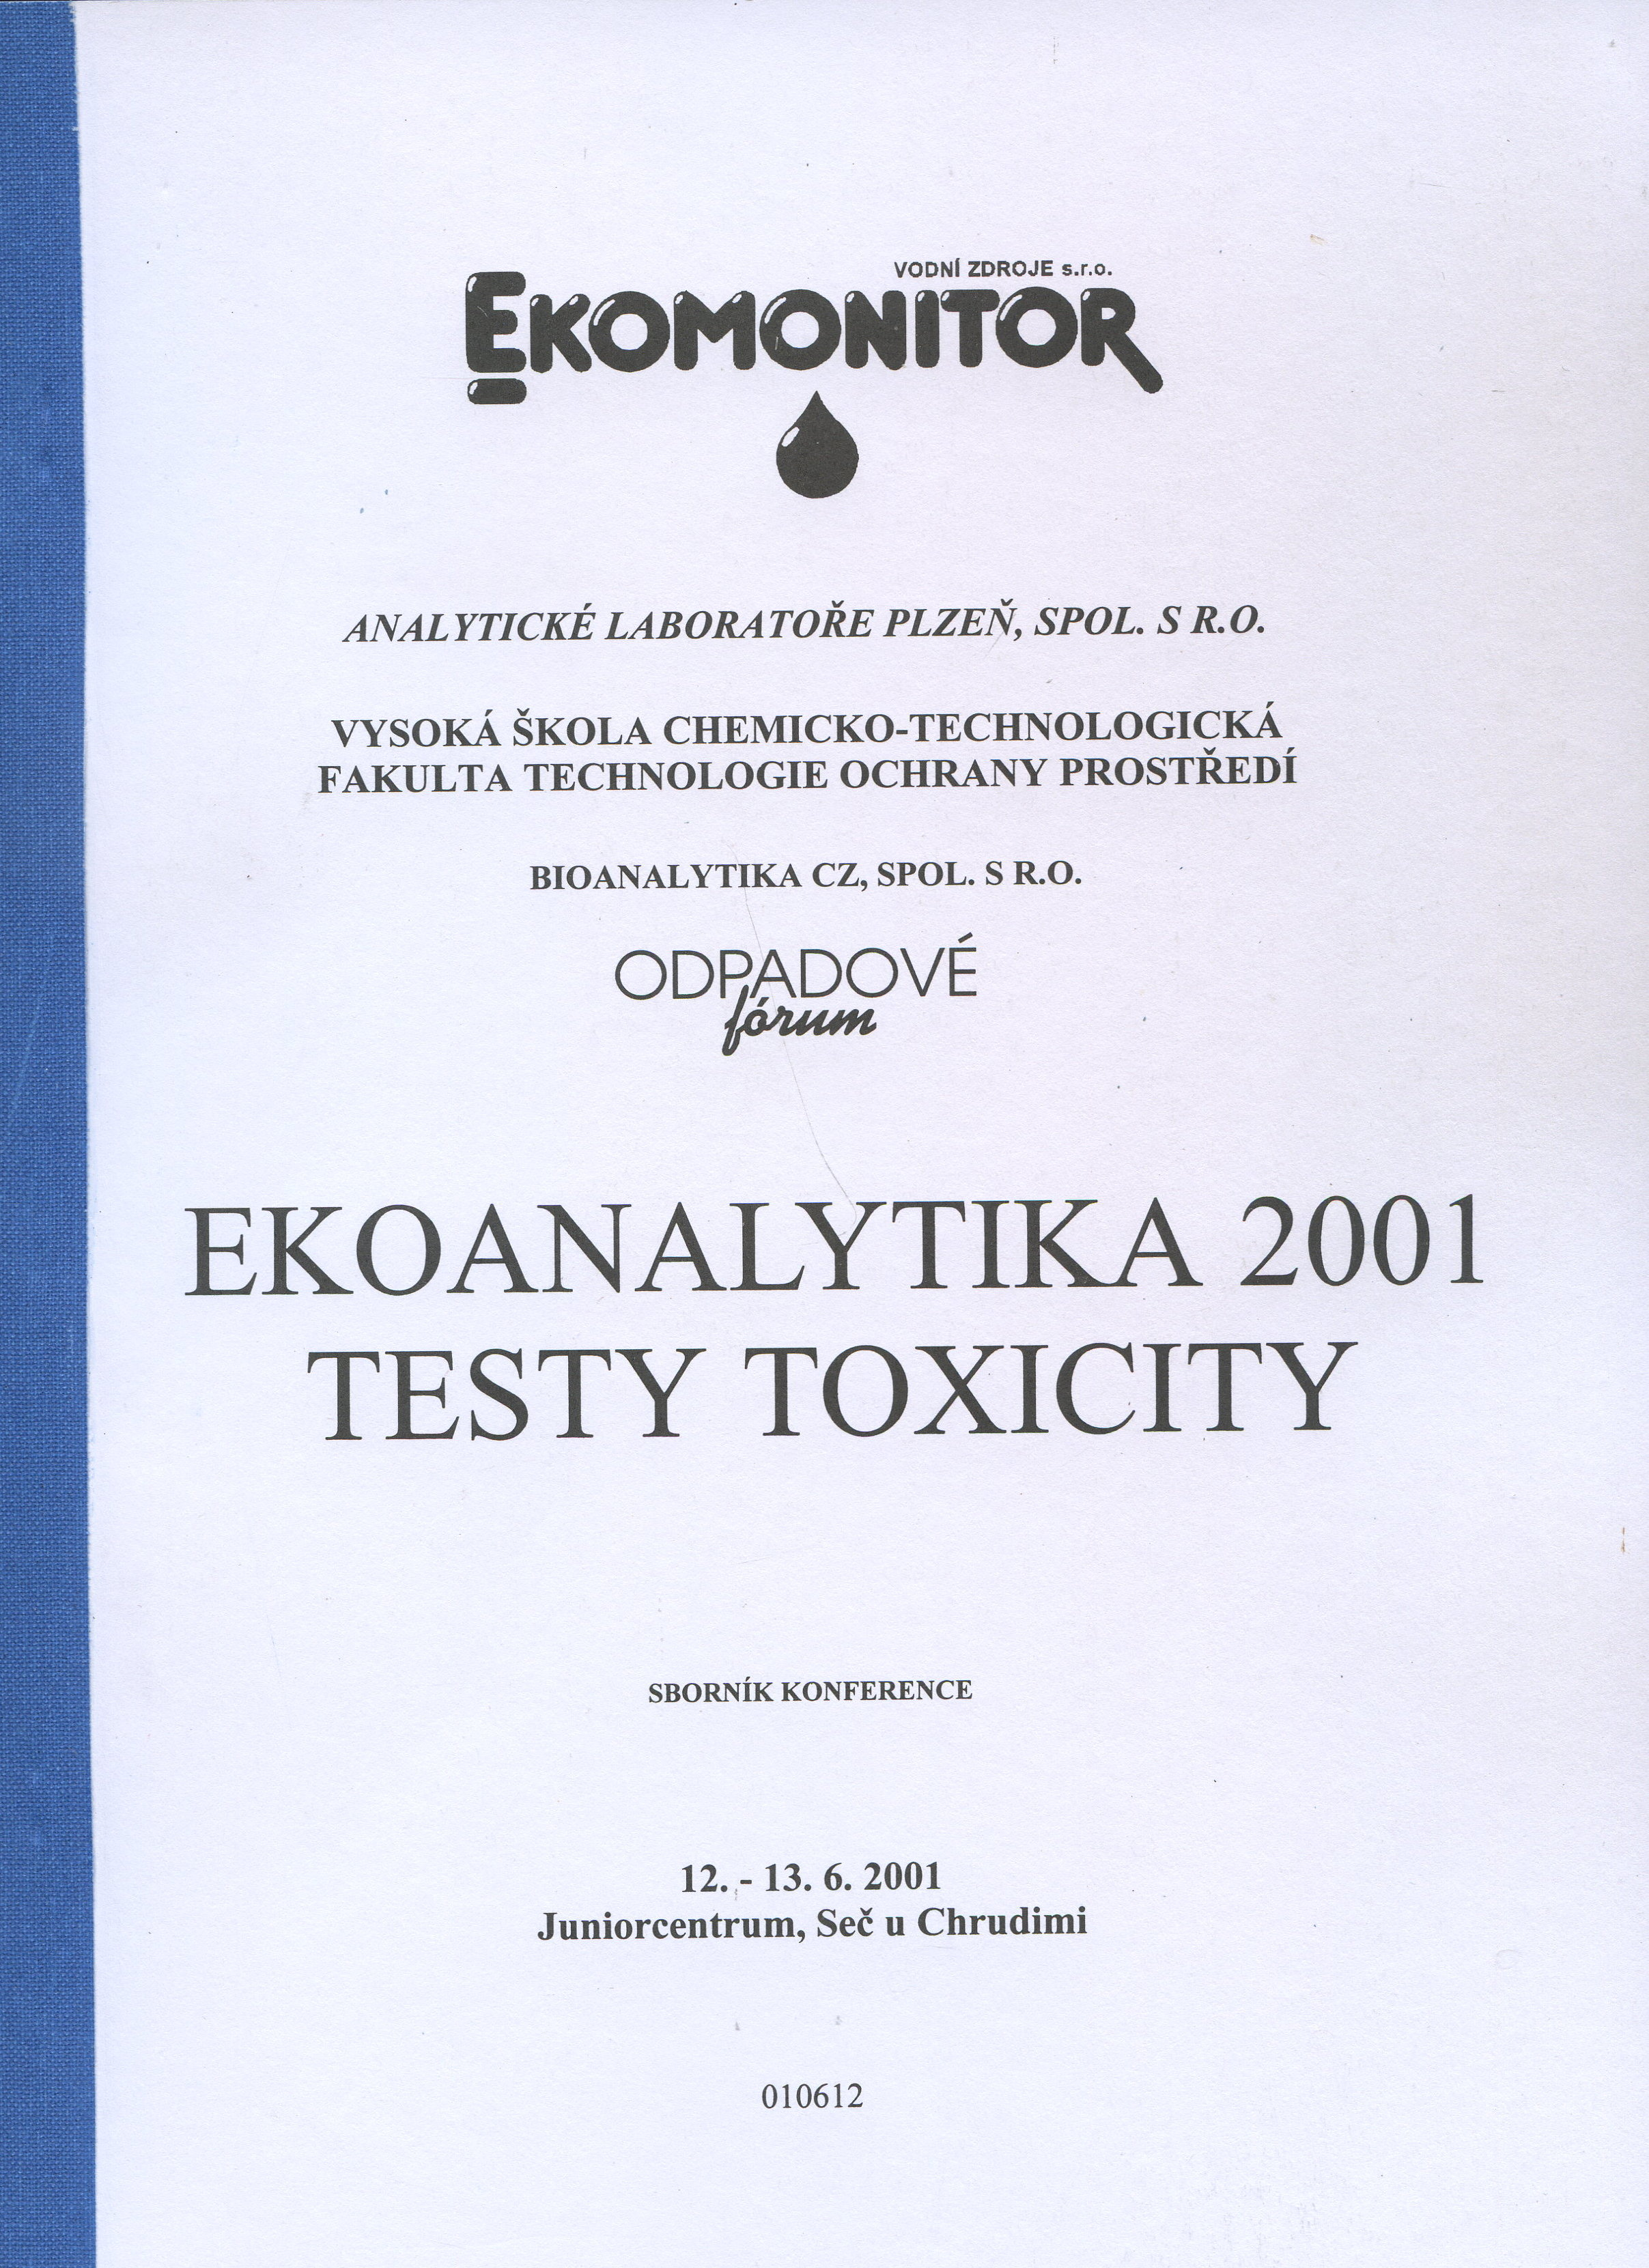 Ekoanalytika 2001 - testy toxicity